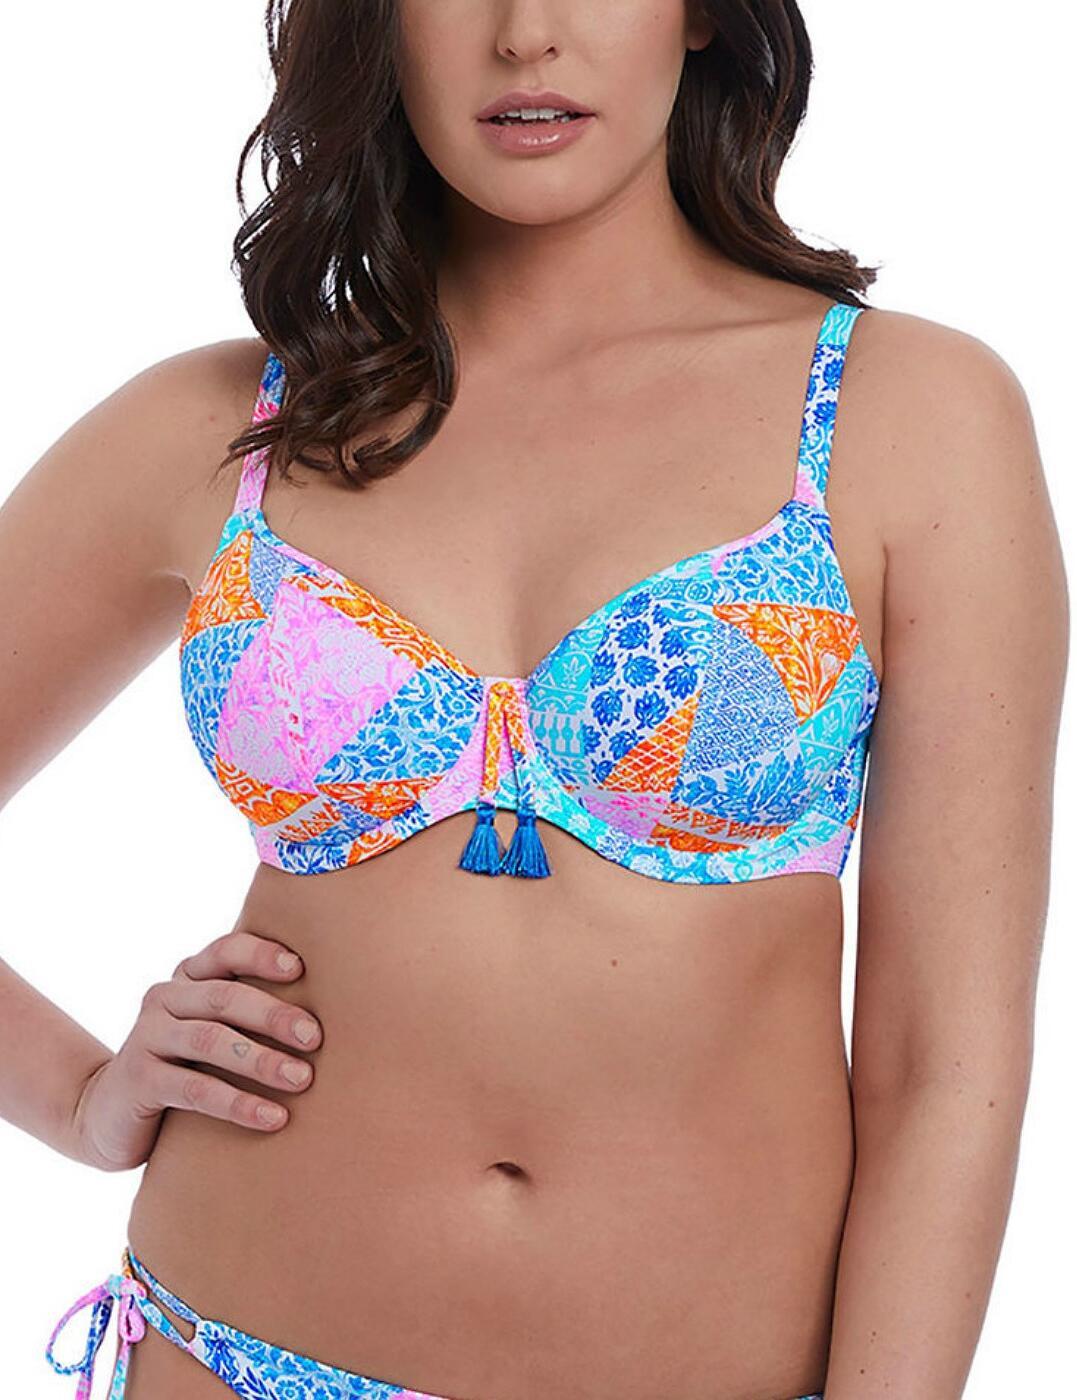 6570 Freya Festival Girl Underwired Plunge Bikini Top - 6570 Multi